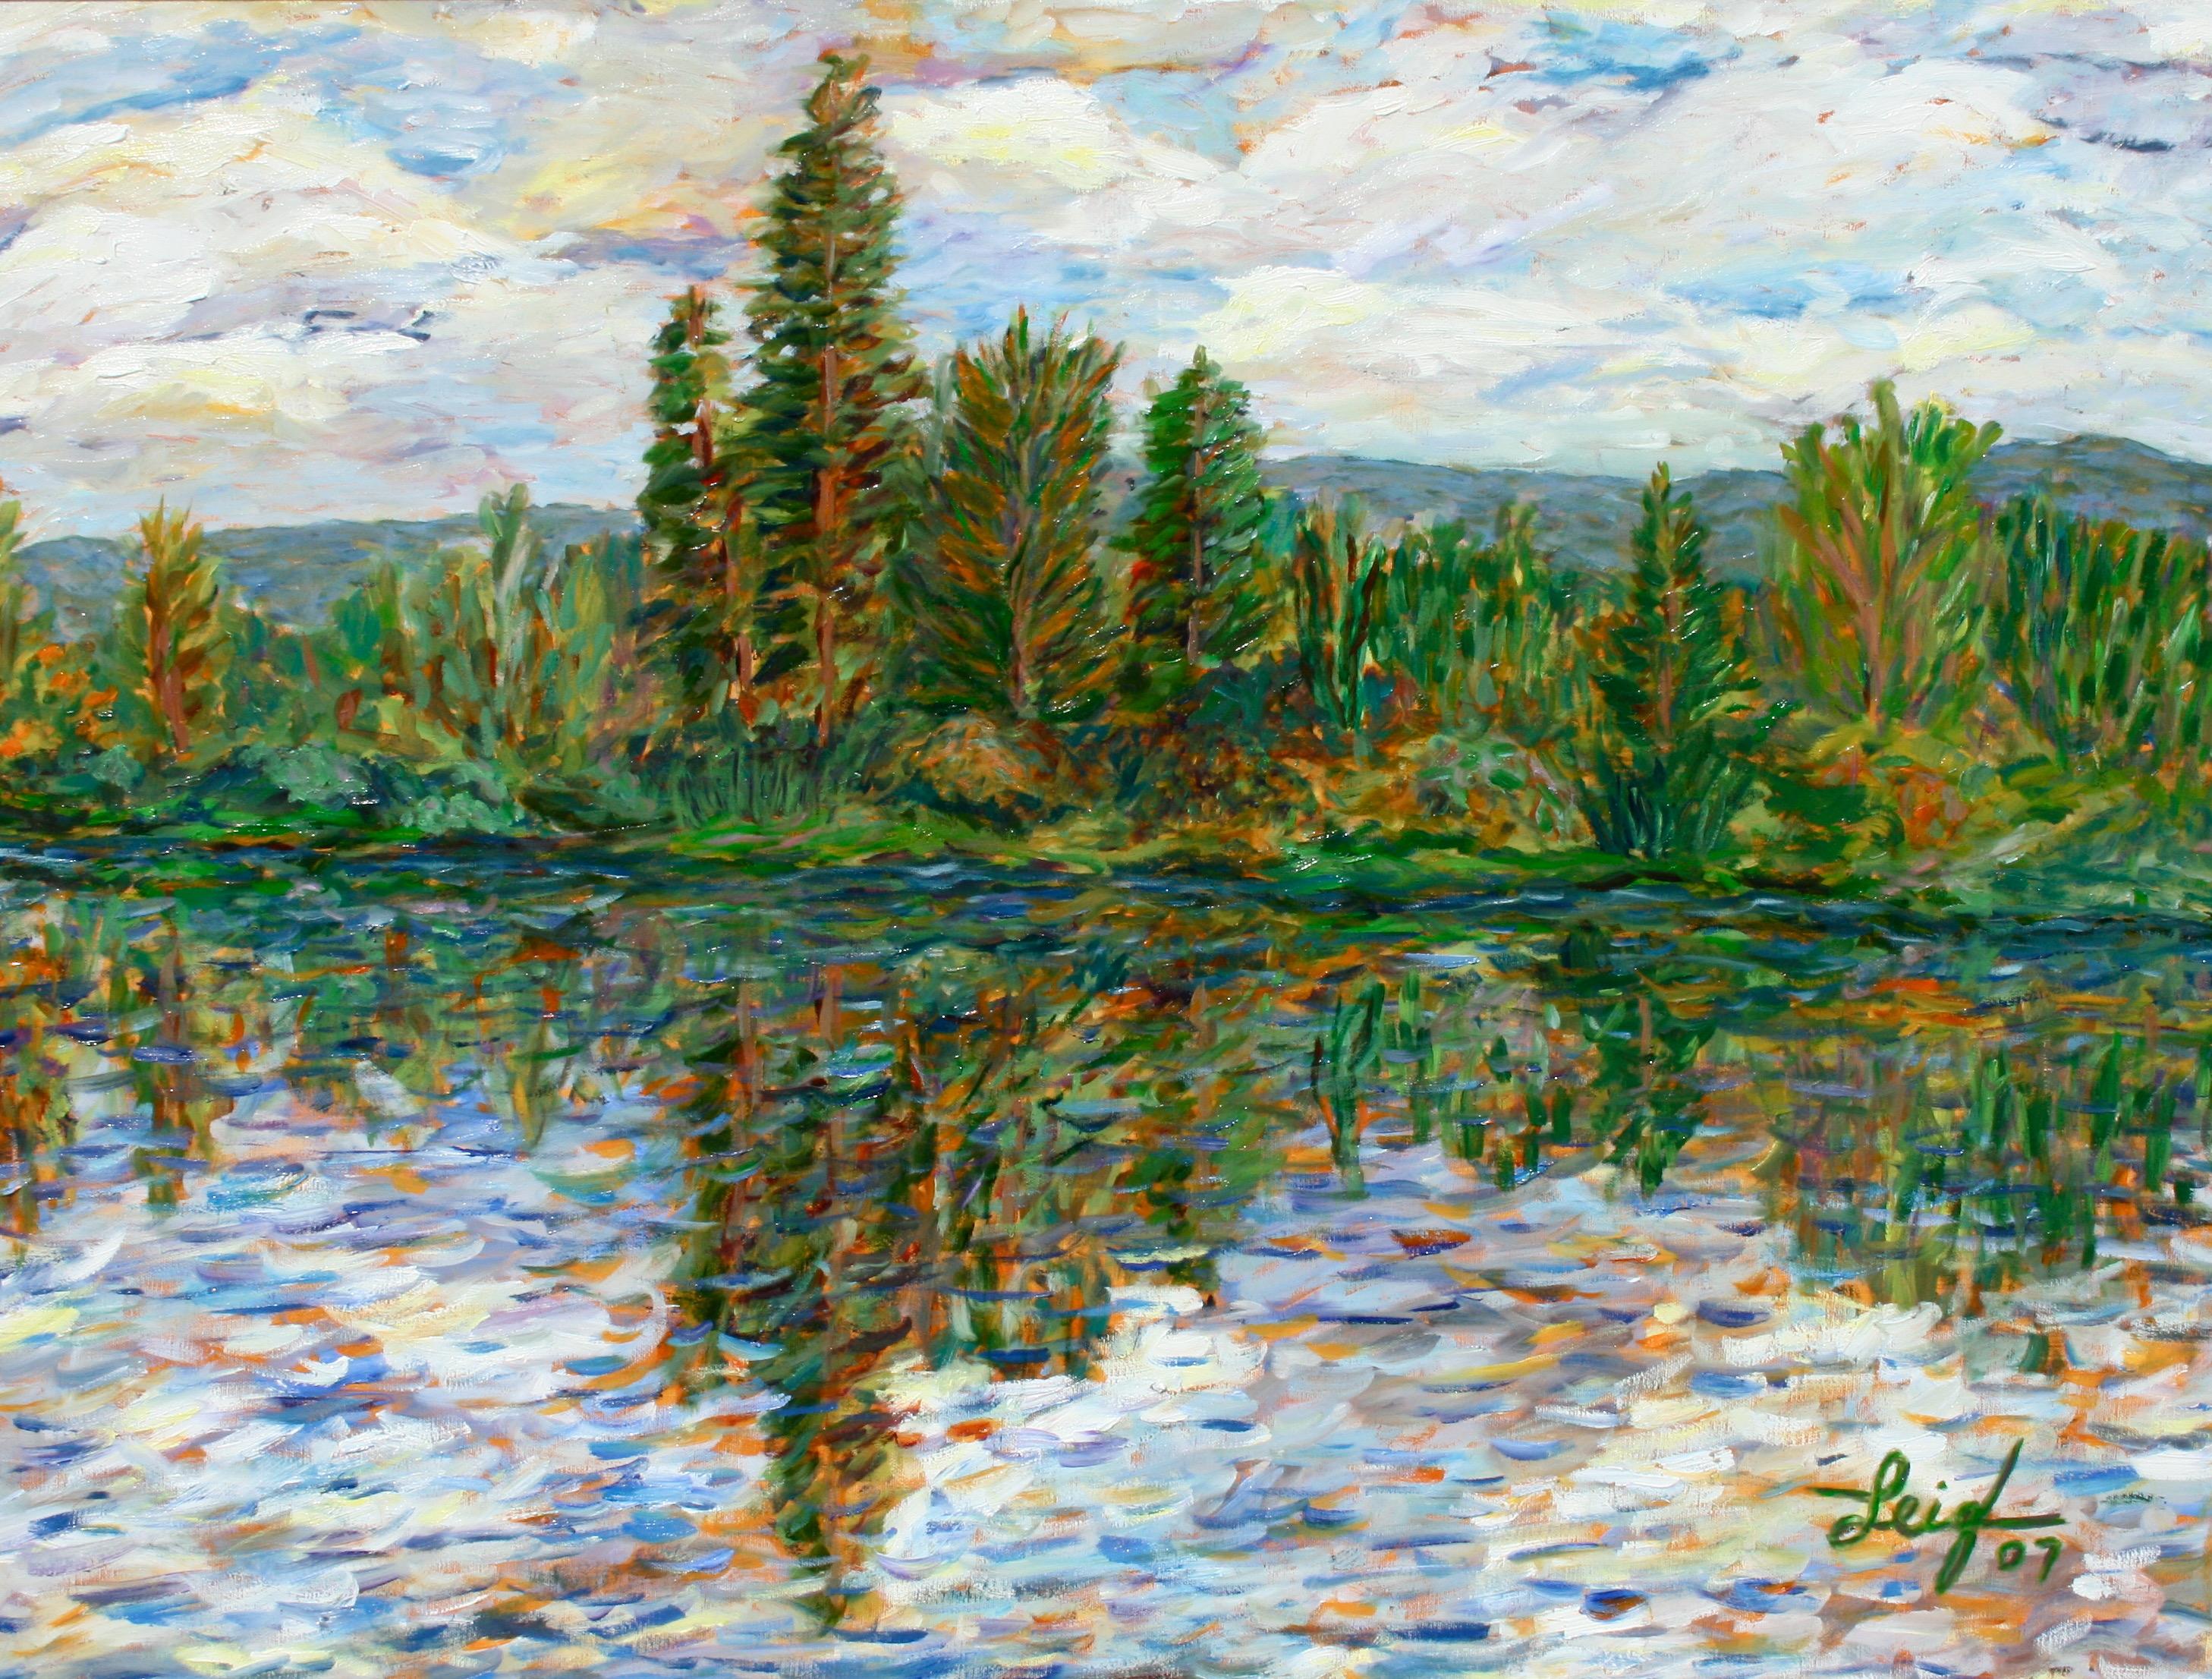 Heart Tree on Swan River  ~   Michael & Jordonna Dores,  Bigfork, MT 2007  •  40 x 30